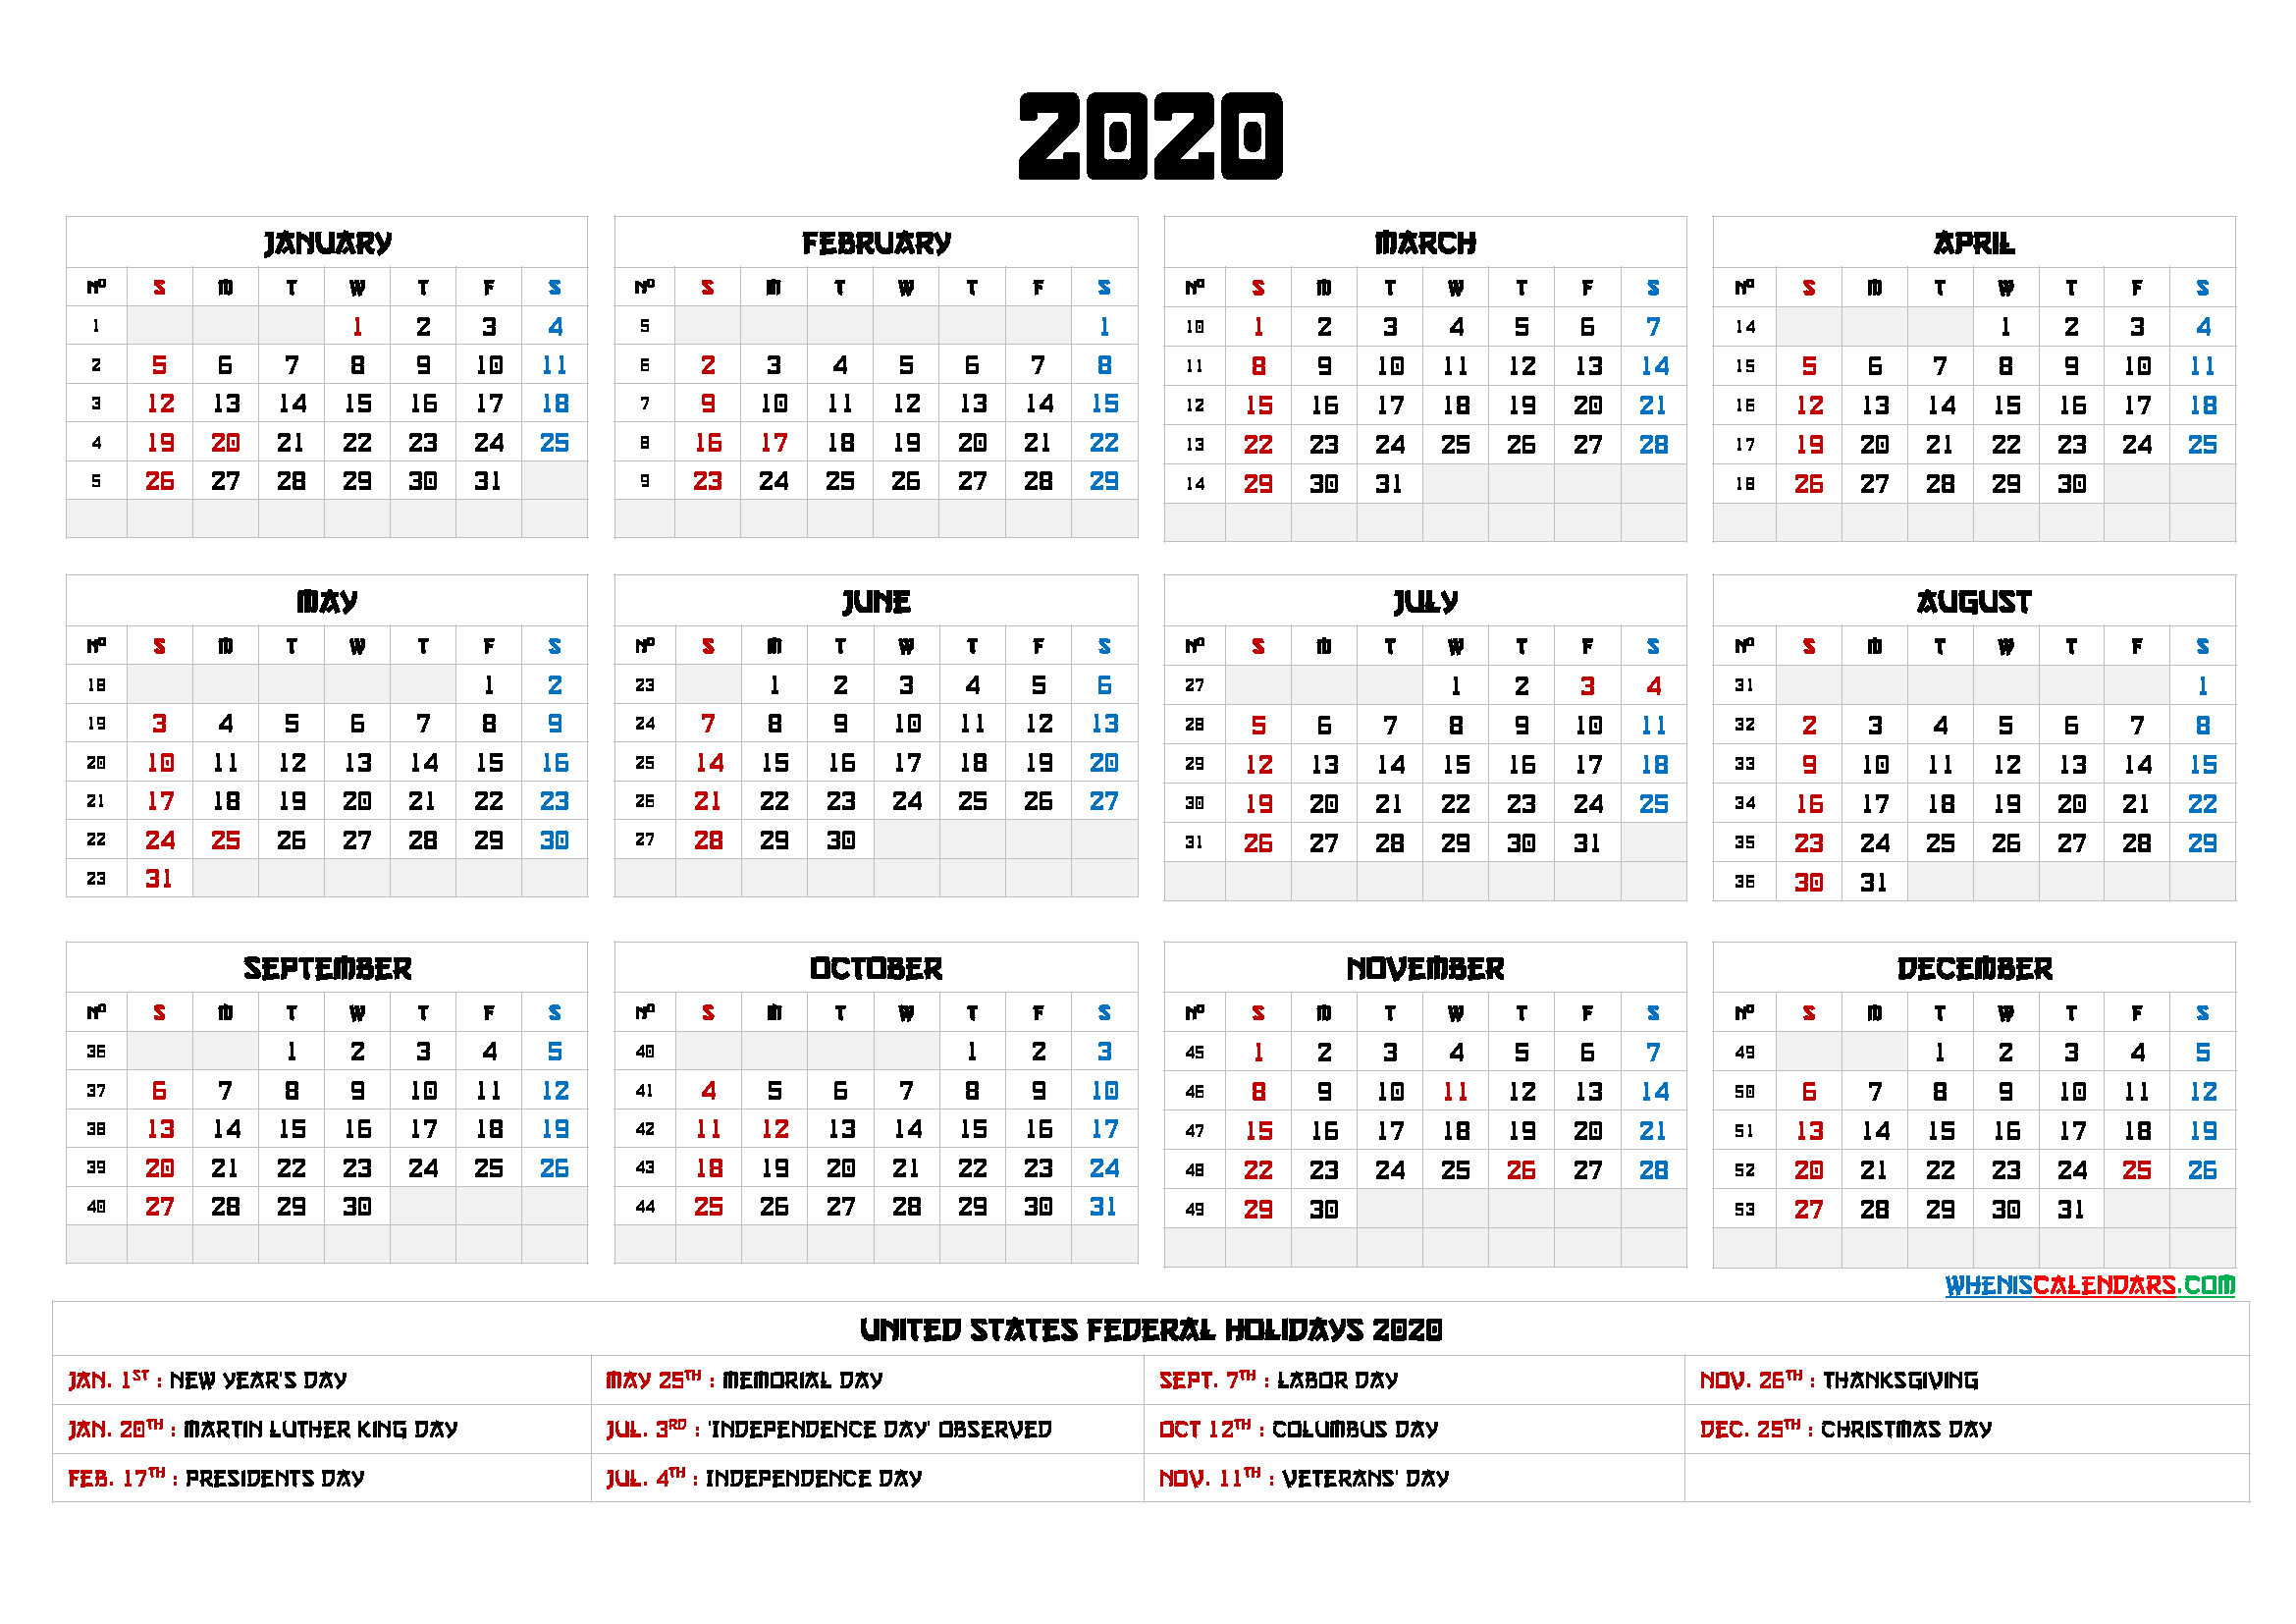 Free Printable Calendar 2020 with Holidays